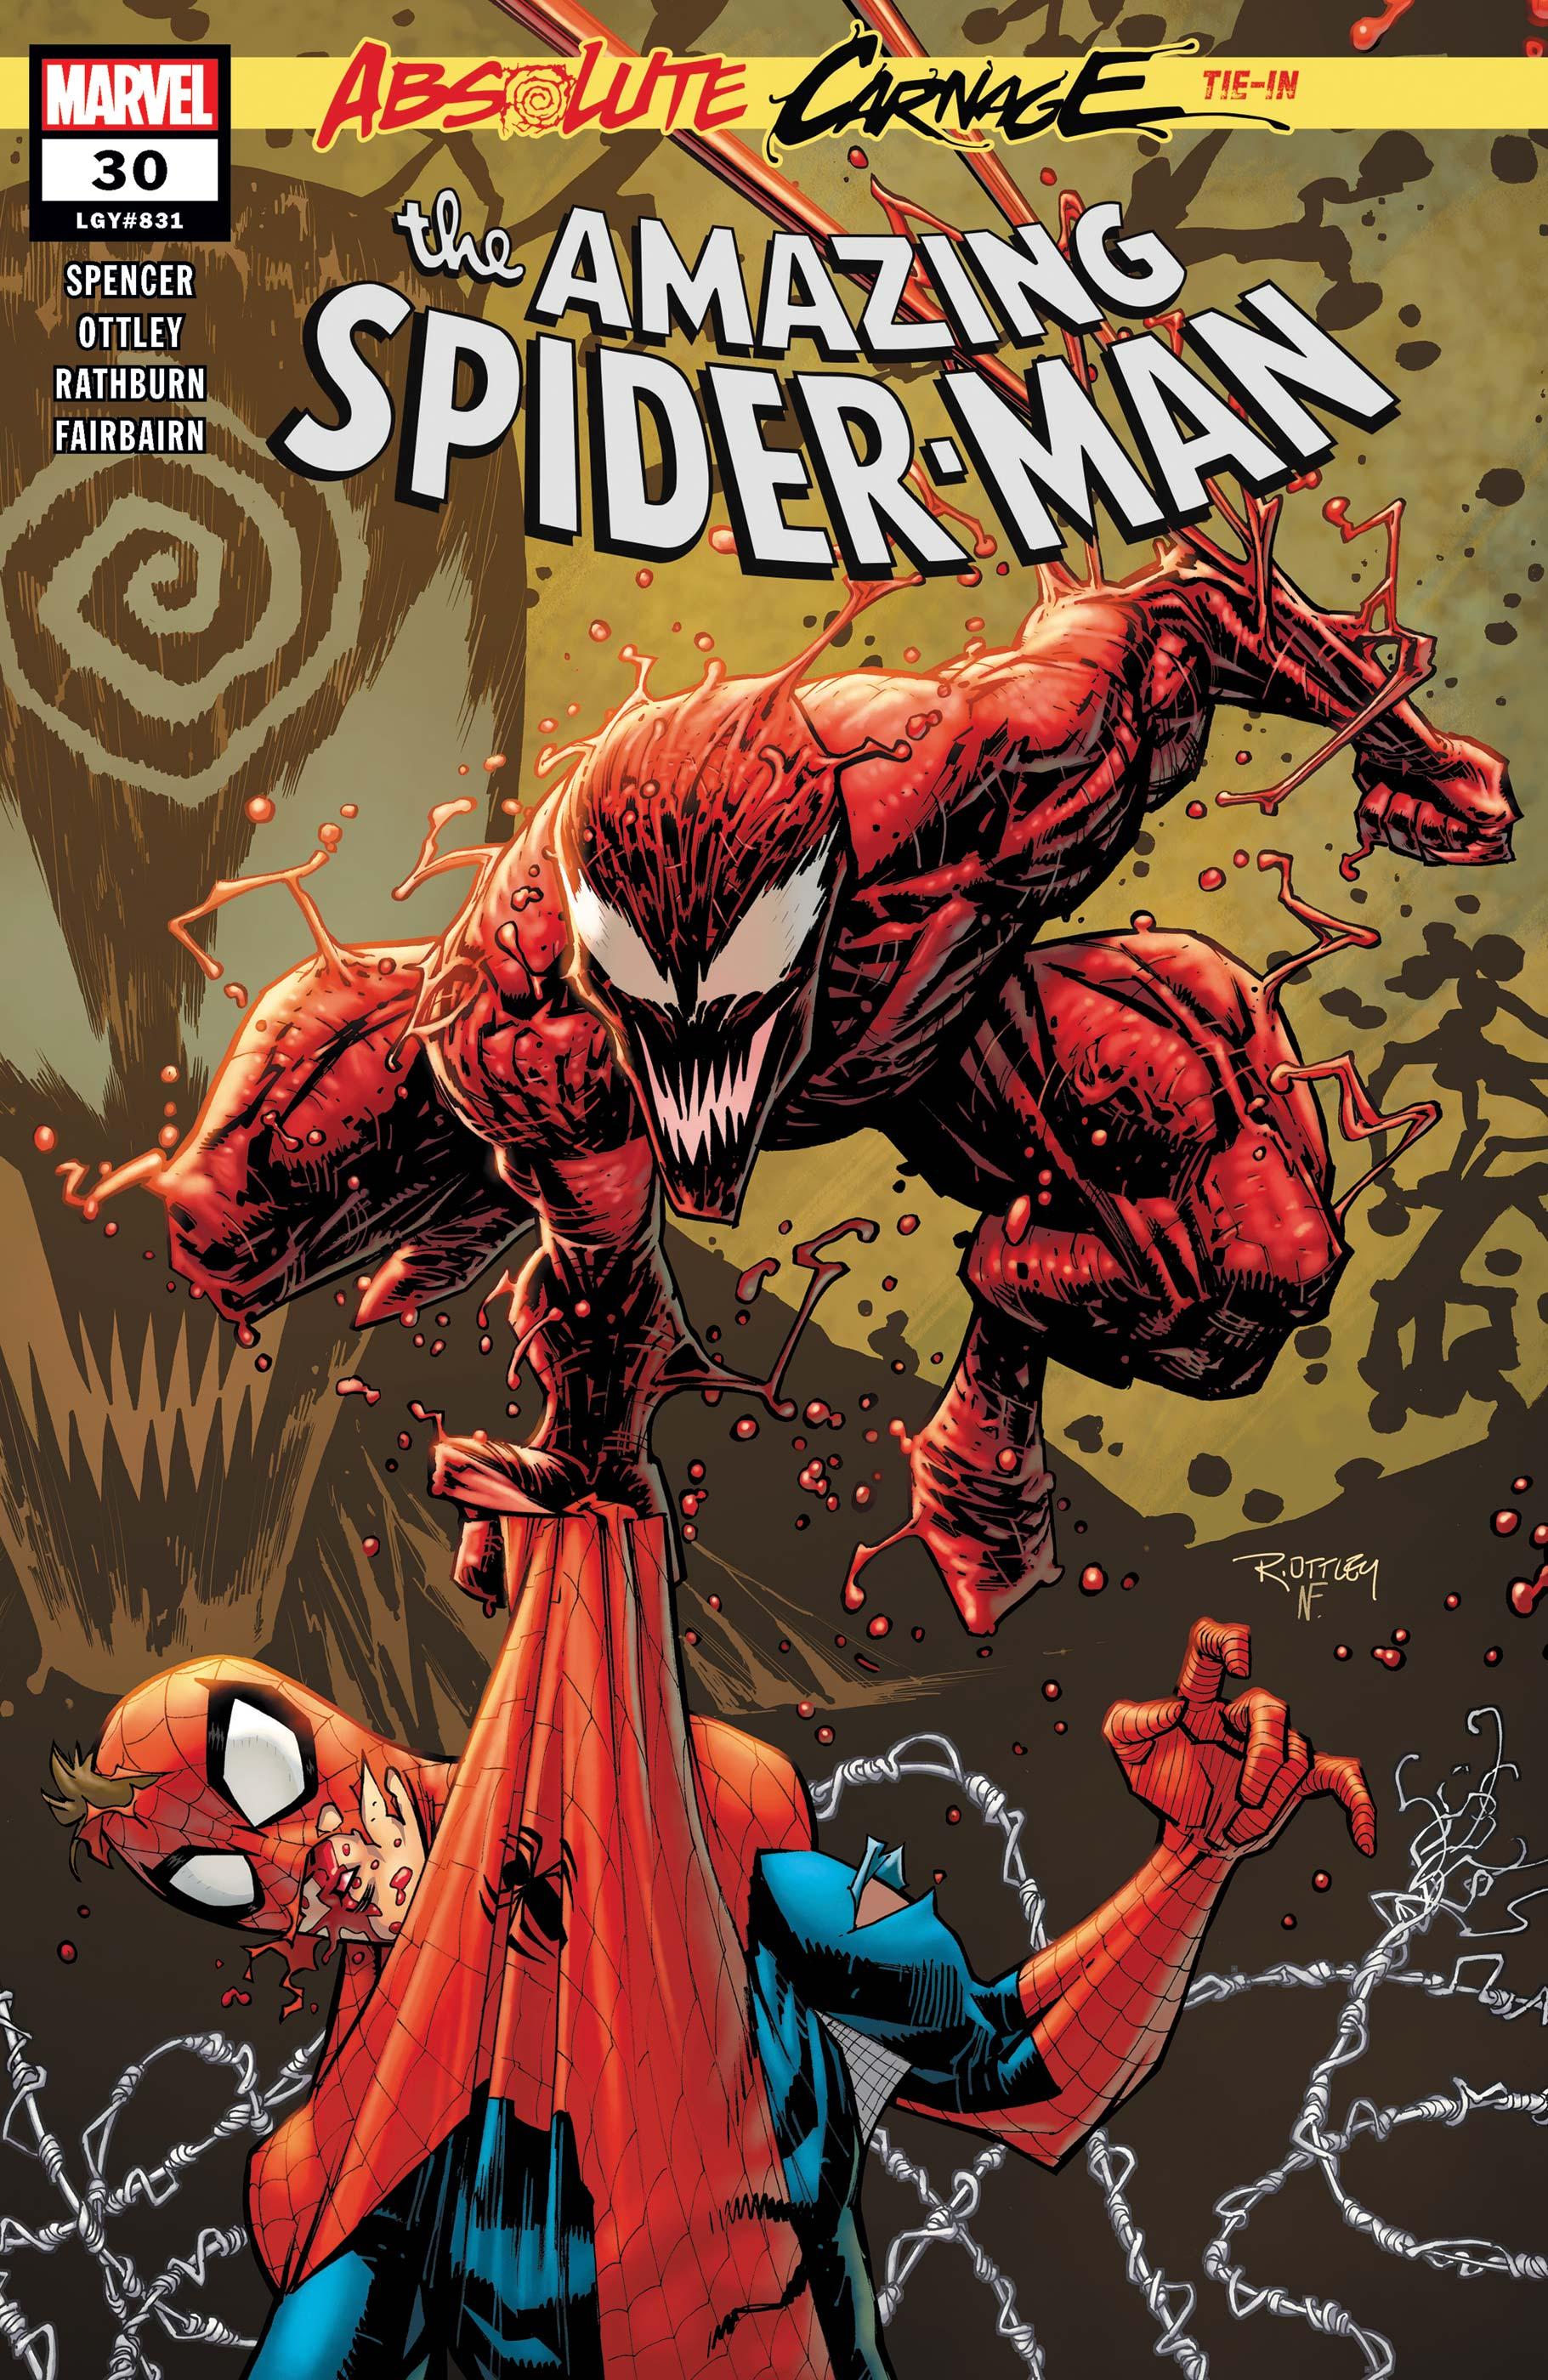 The Amazing Spider-Man (2018) #30